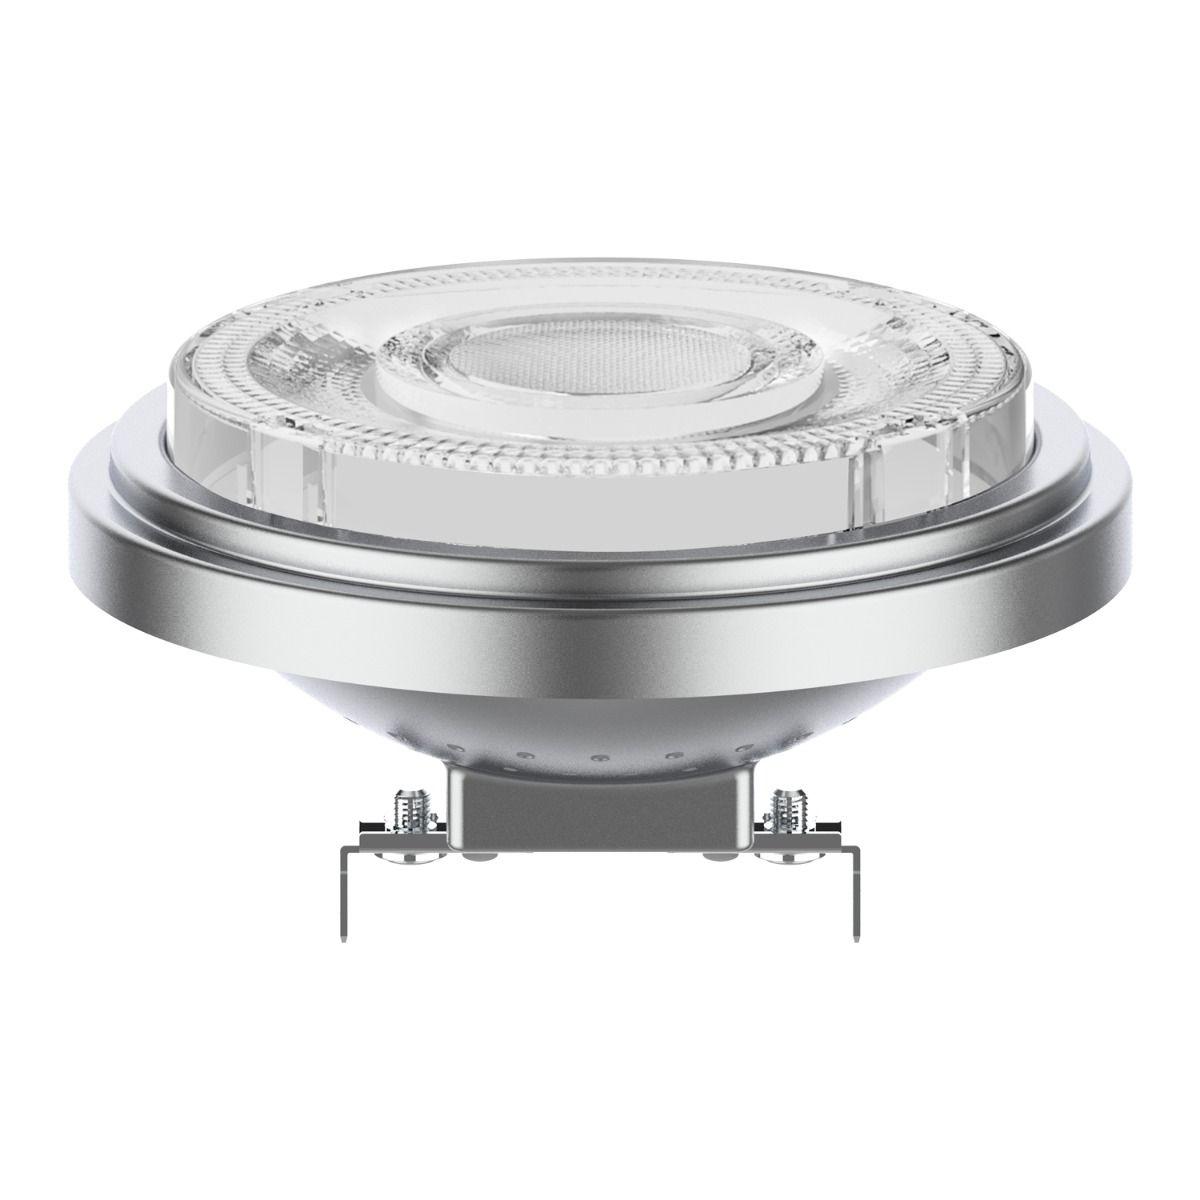 Noxion Lucent LED Spot AR111 G53 12V 7.3W 927 24D | Dimbaar - Hoogste Kleurweergave - Vervanger voor 50W